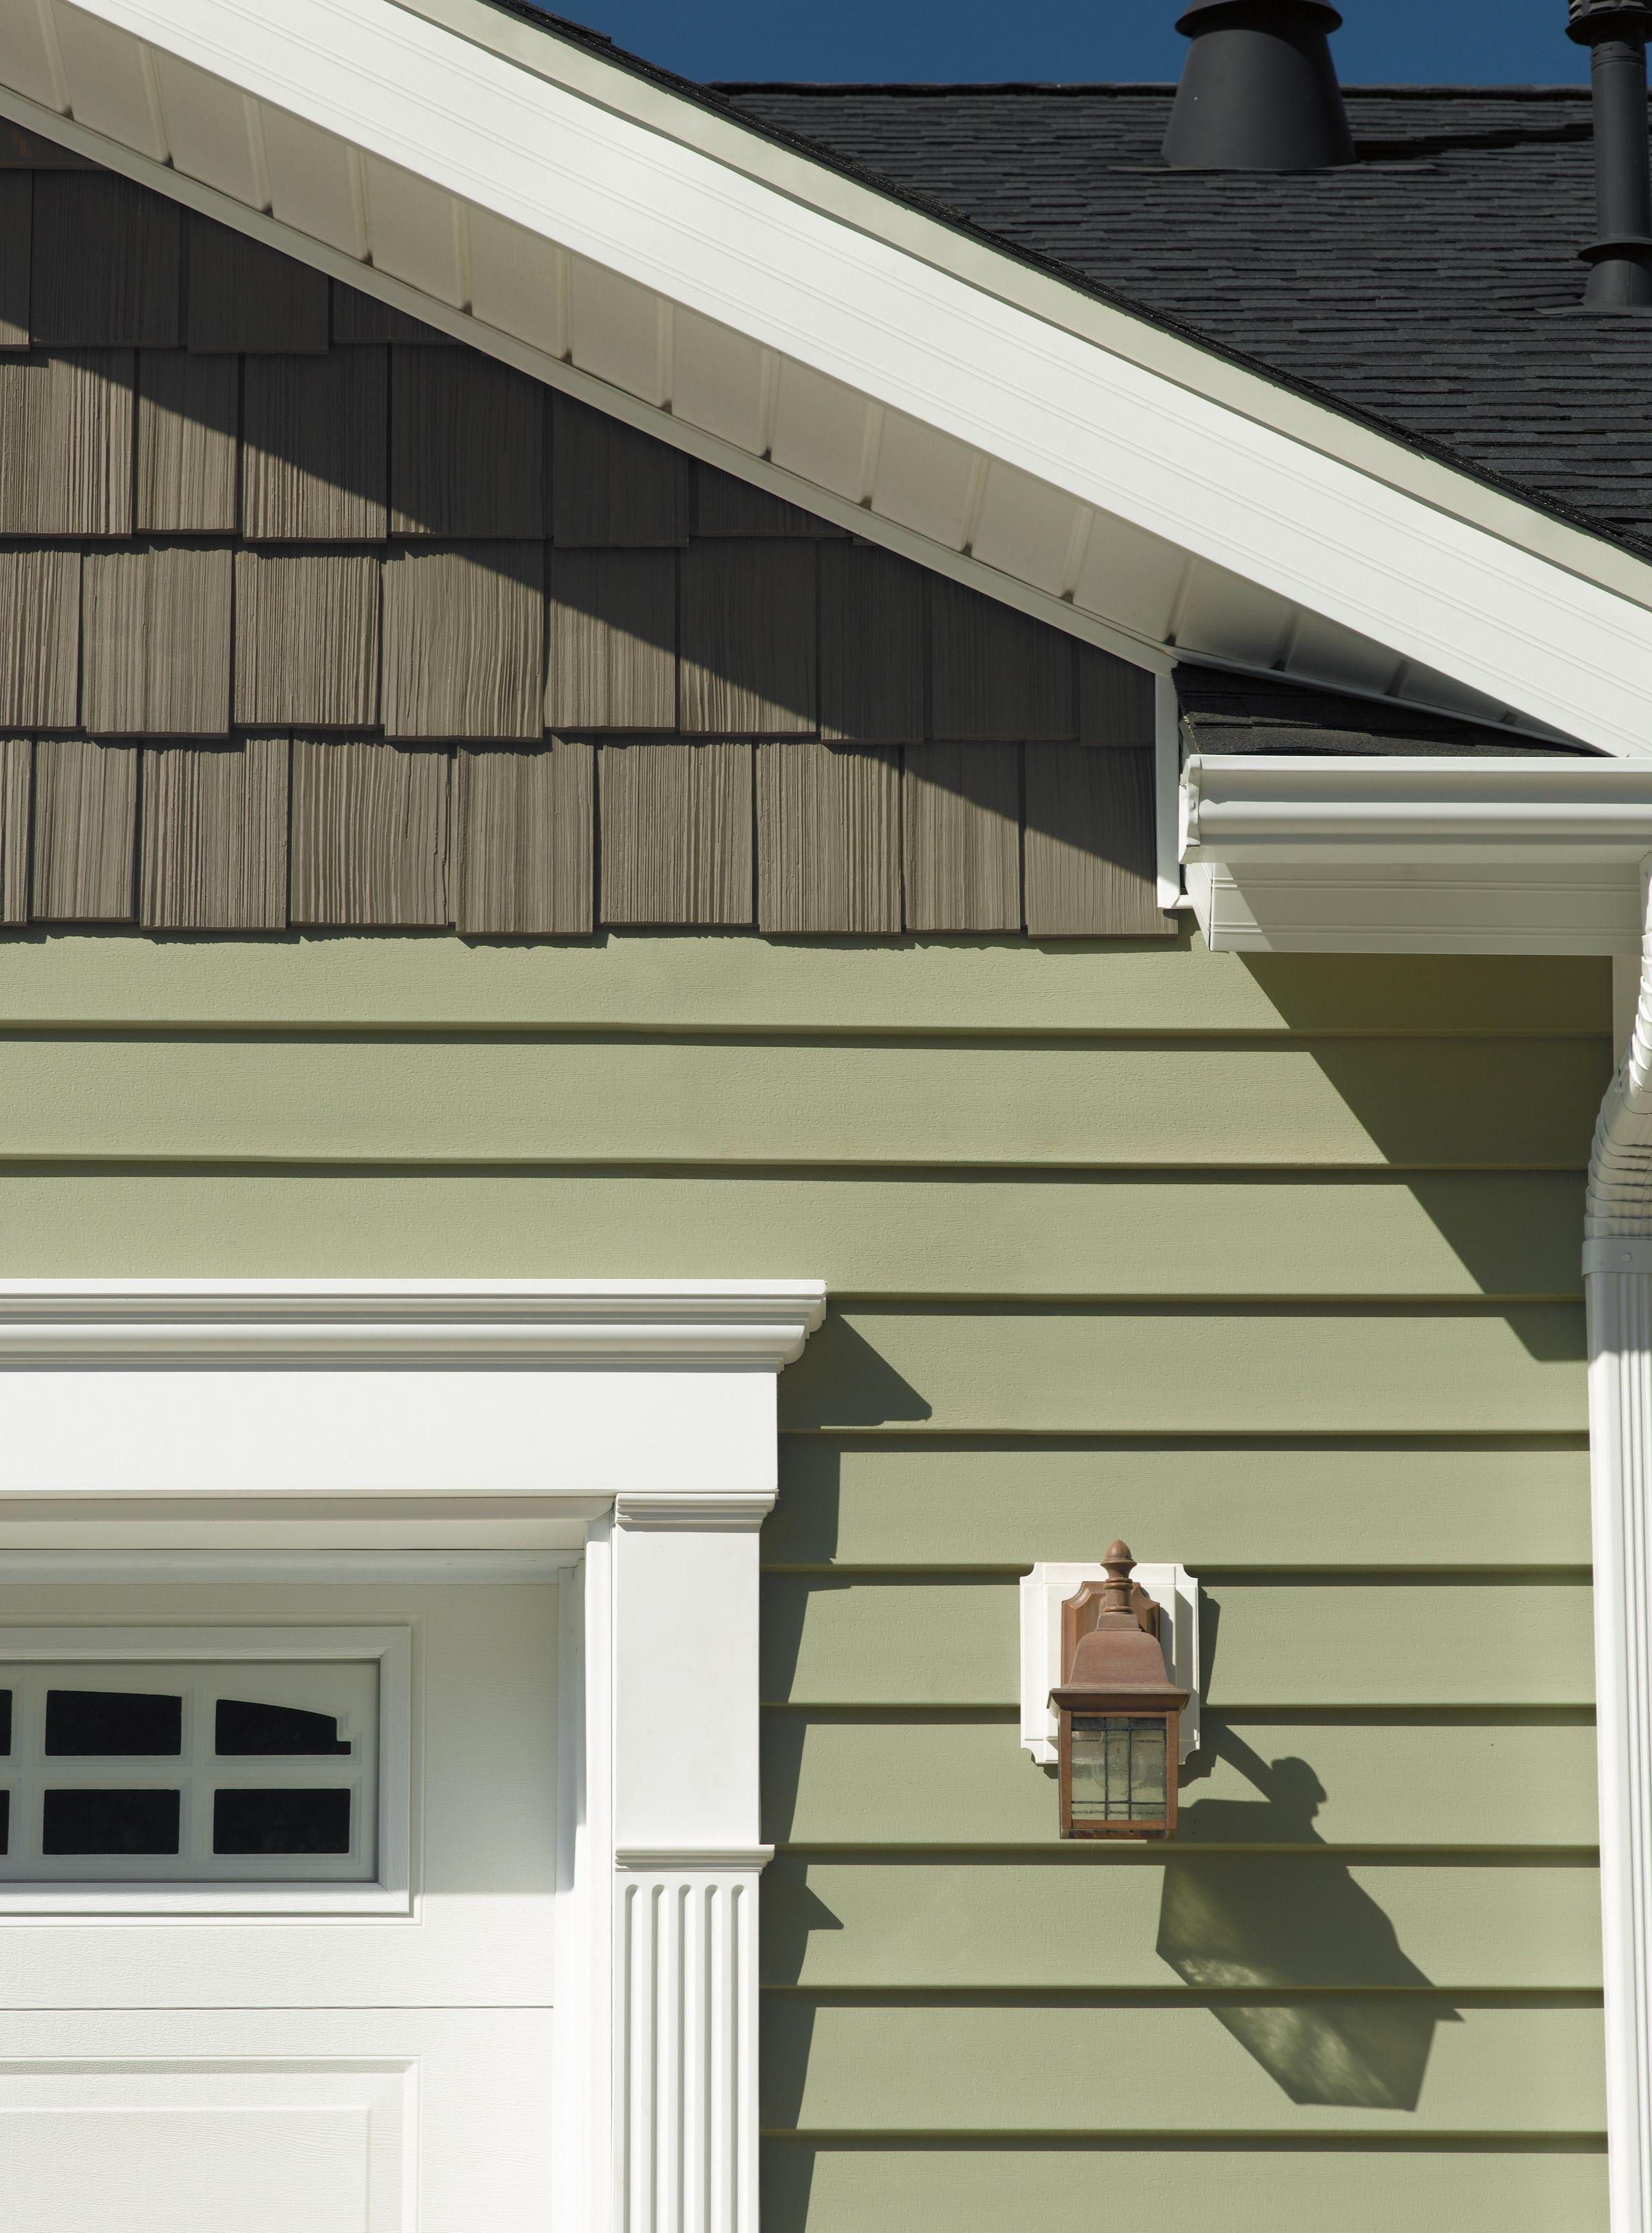 Best Certainteed Siding Cedar Boards Green Siding House 400 x 300